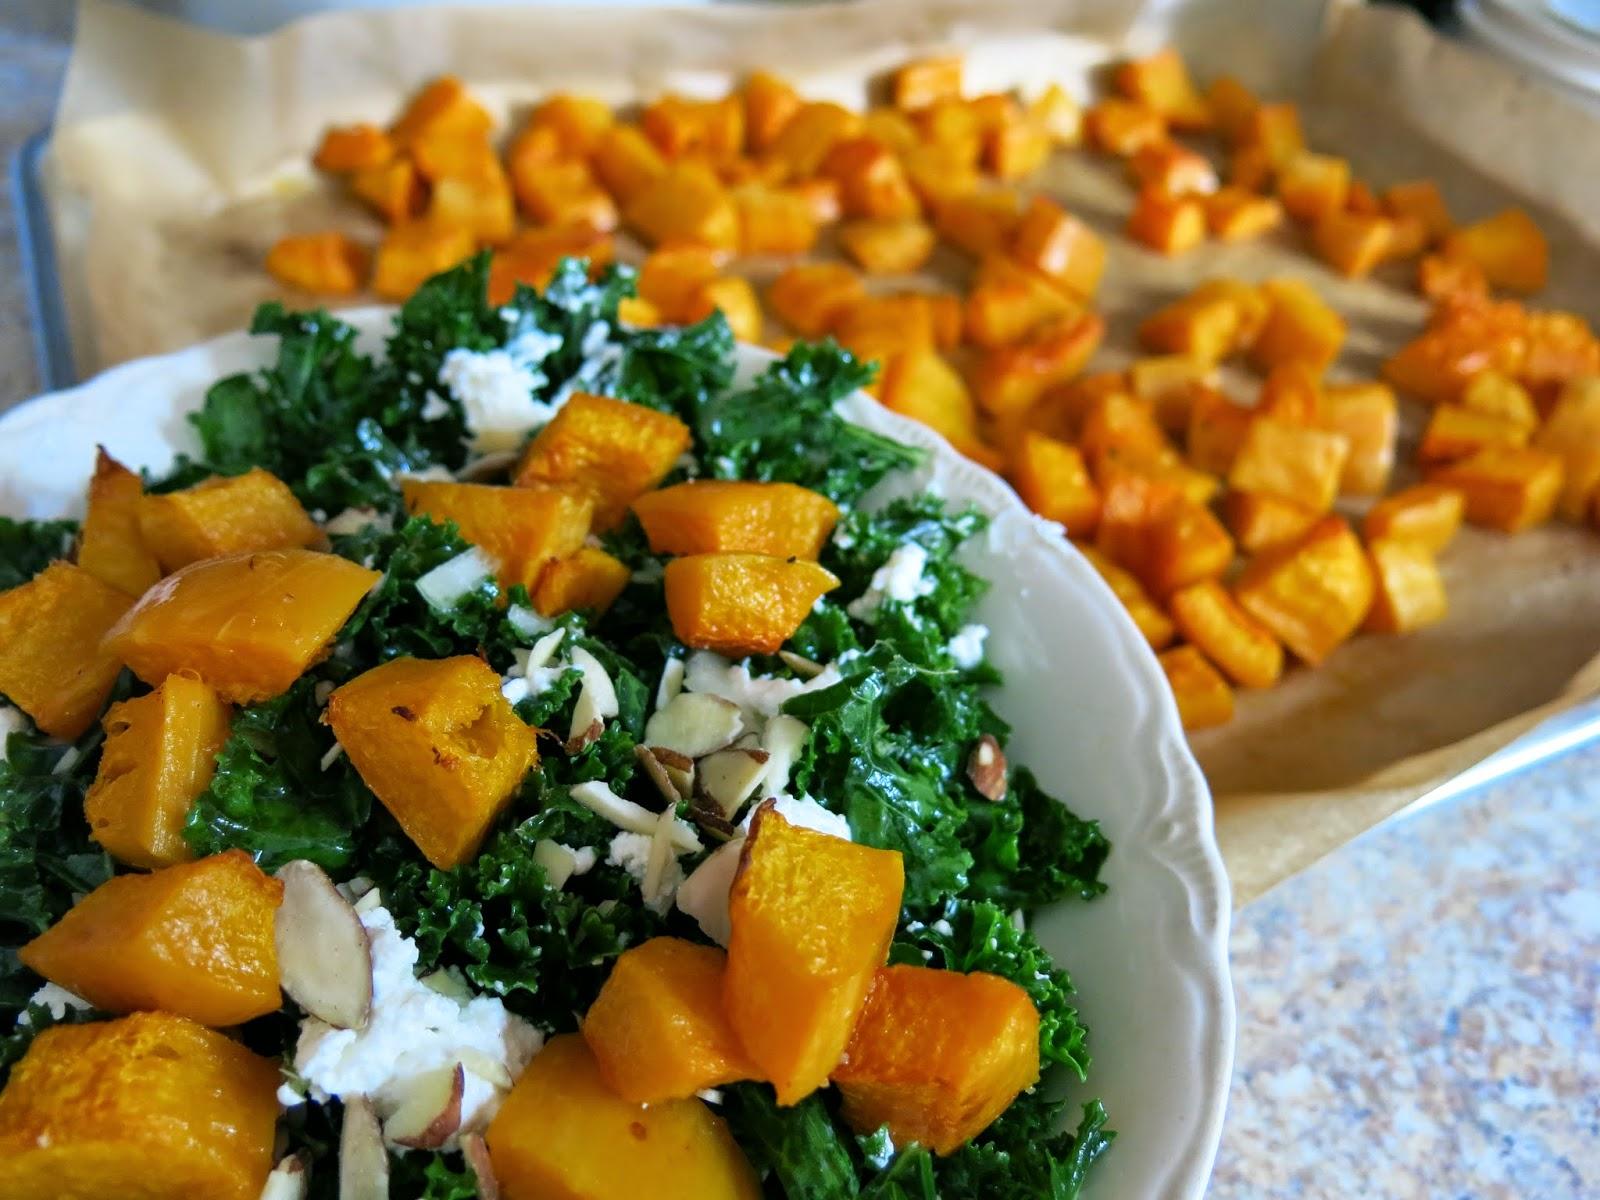 Andrea In Season: Lacinato Kale Salad with Roasted Squash